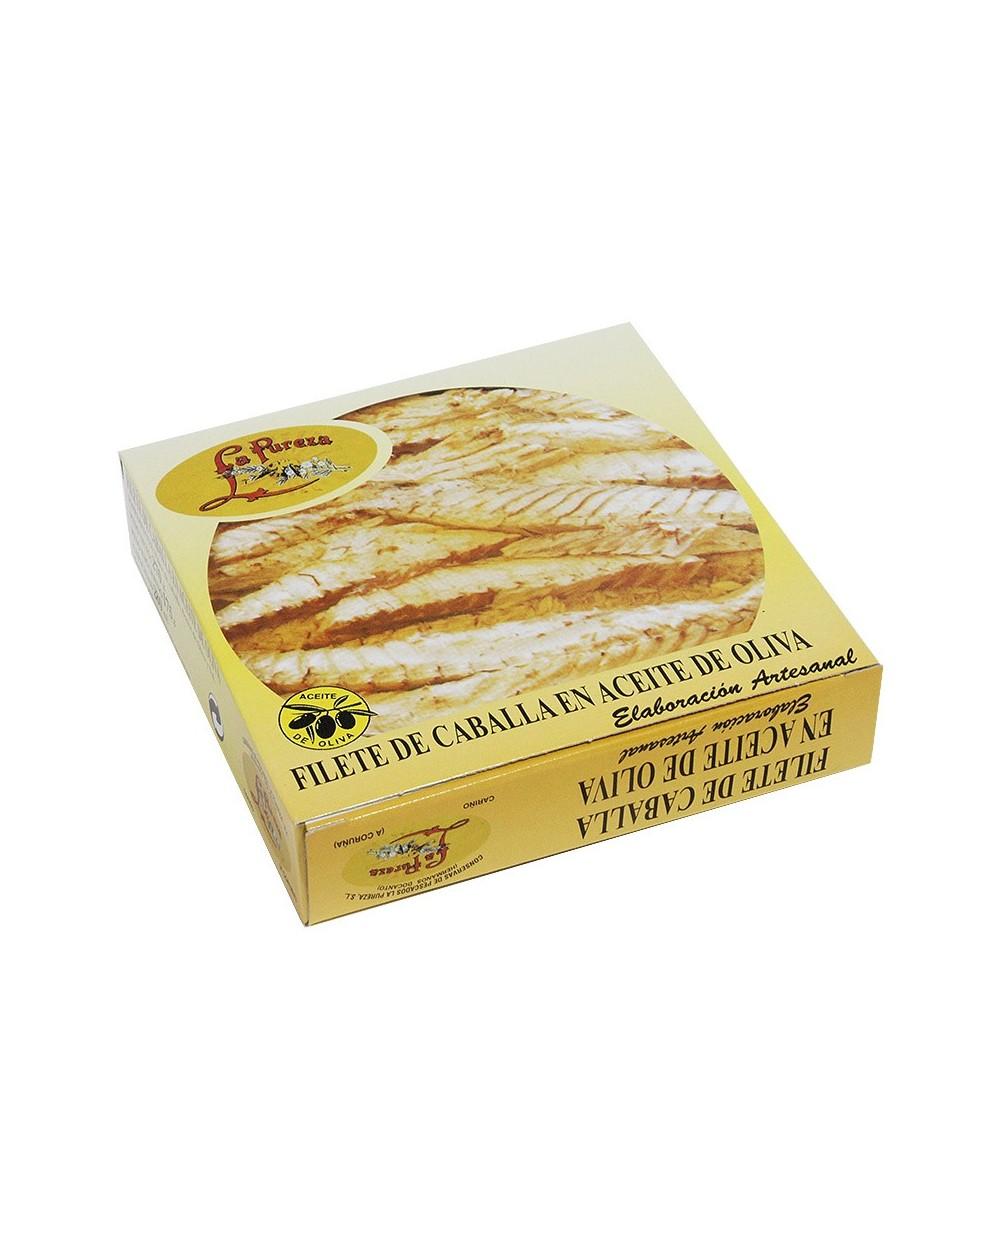 Filetes de Caballa en Aceite de Oliva LA PUREZA 275 gr.